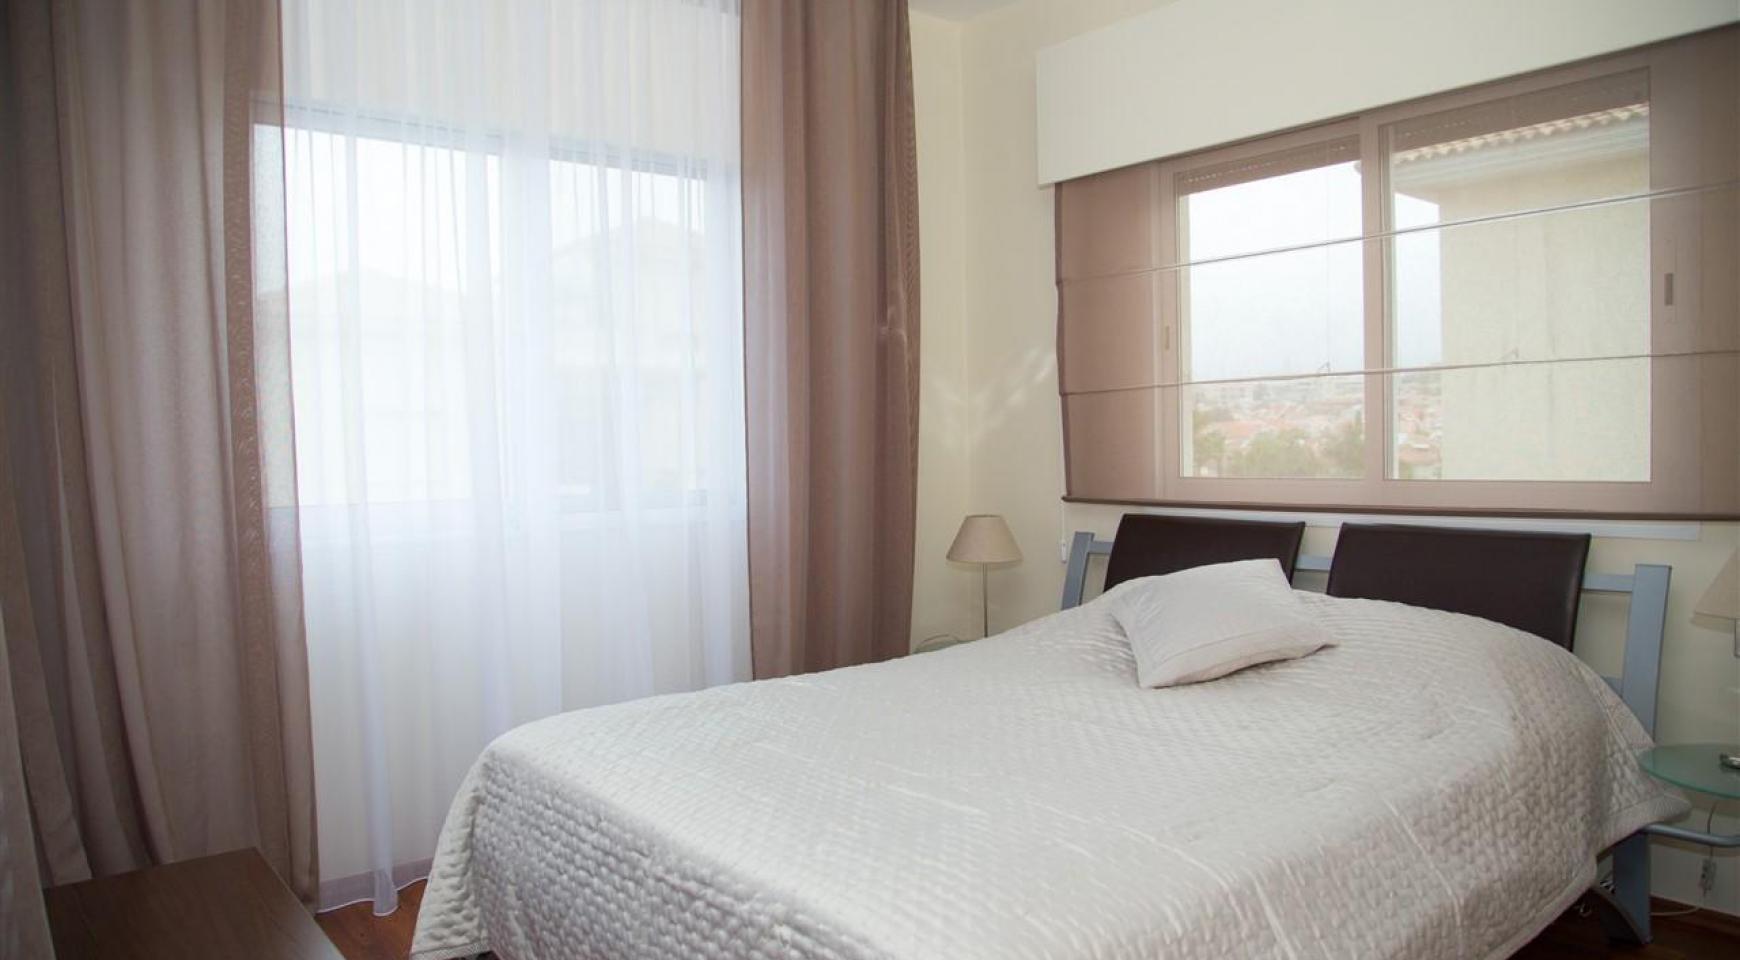 Luxury 2 Bedroom Apartment Mesogios Iris 304 in the Tourist area near the Beach - 15